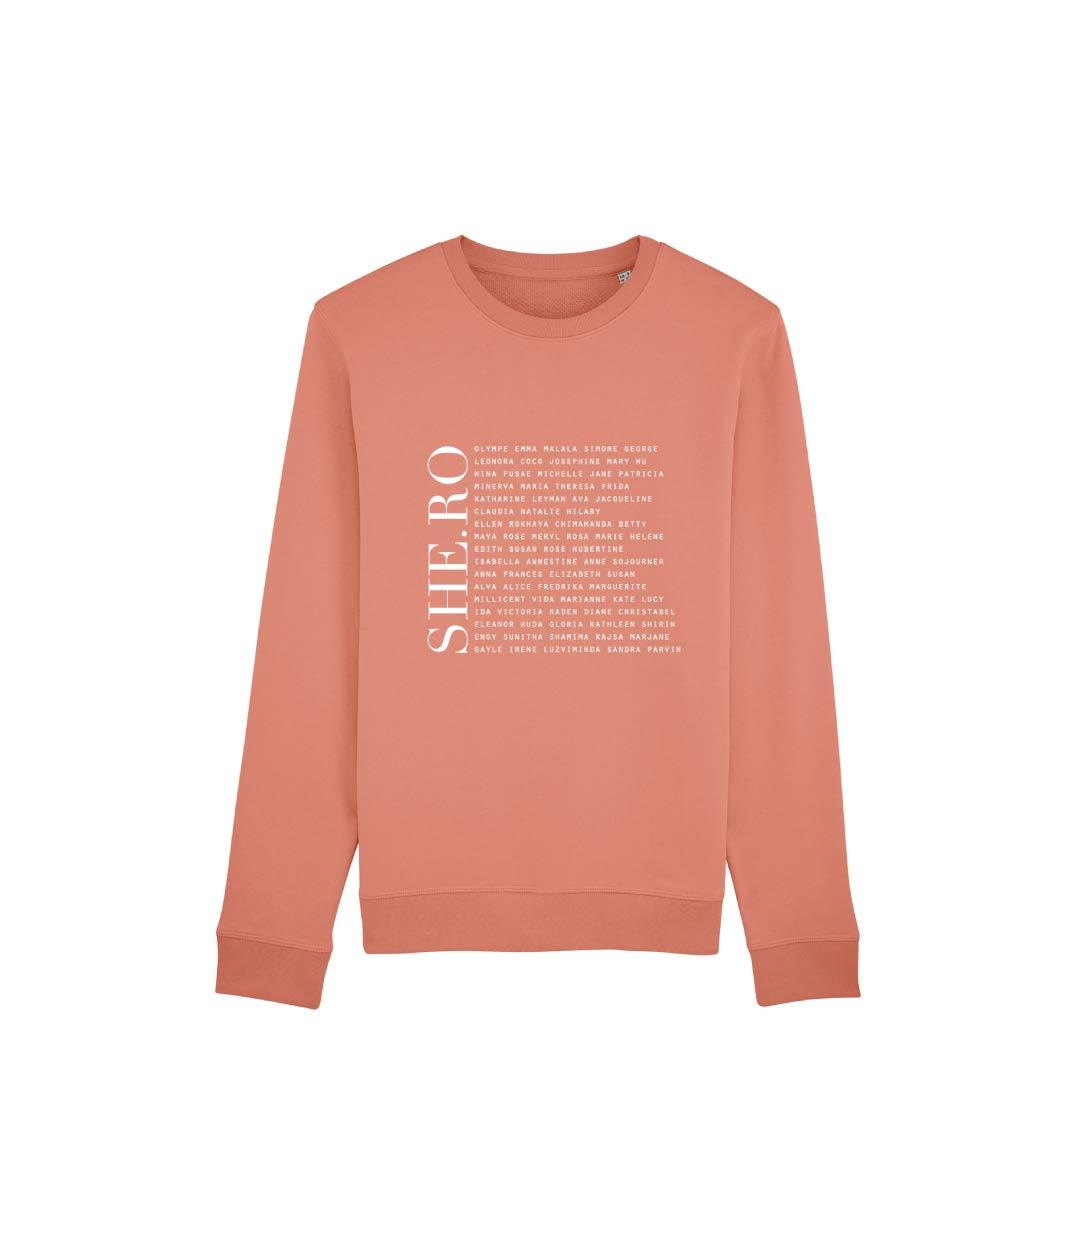 mockup sweatshirt rose feministe shero leonor roversi